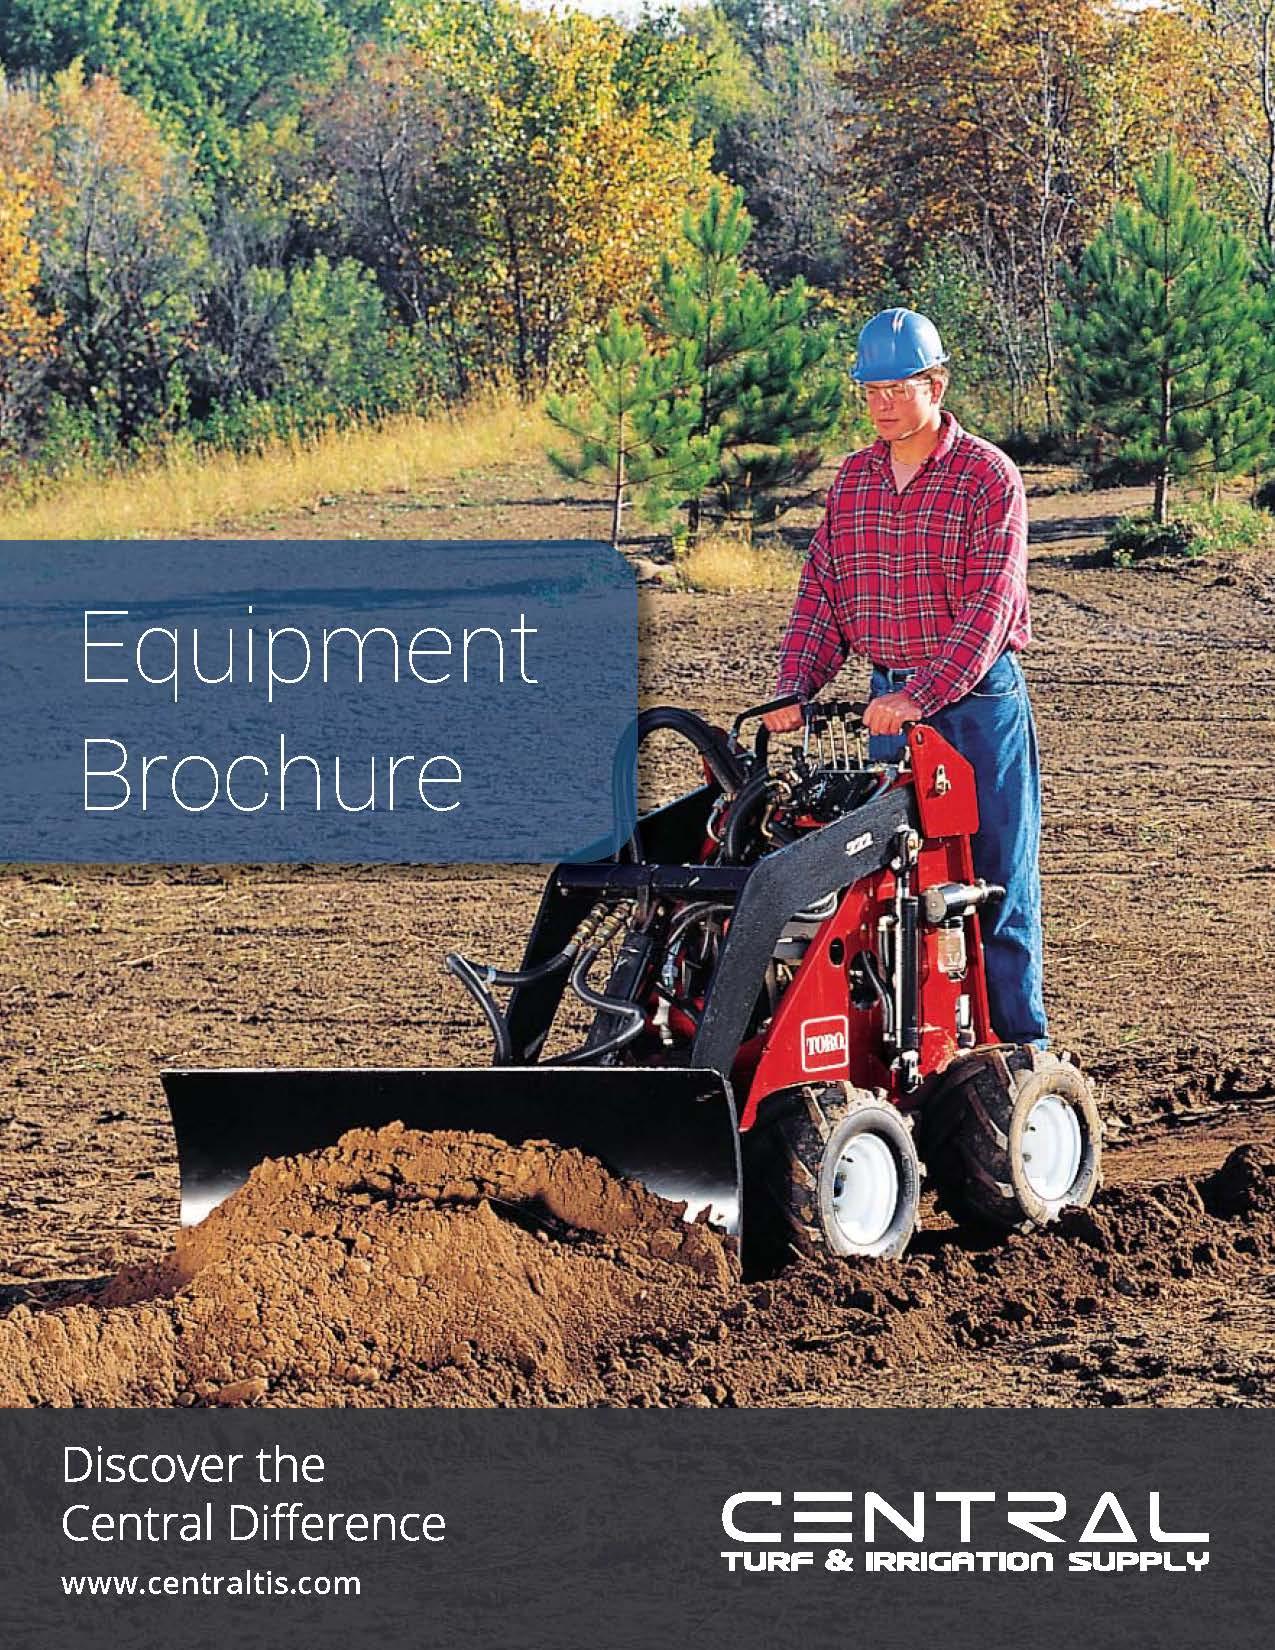 2015 Equipment Brochure 1.3_Page_1.jpg